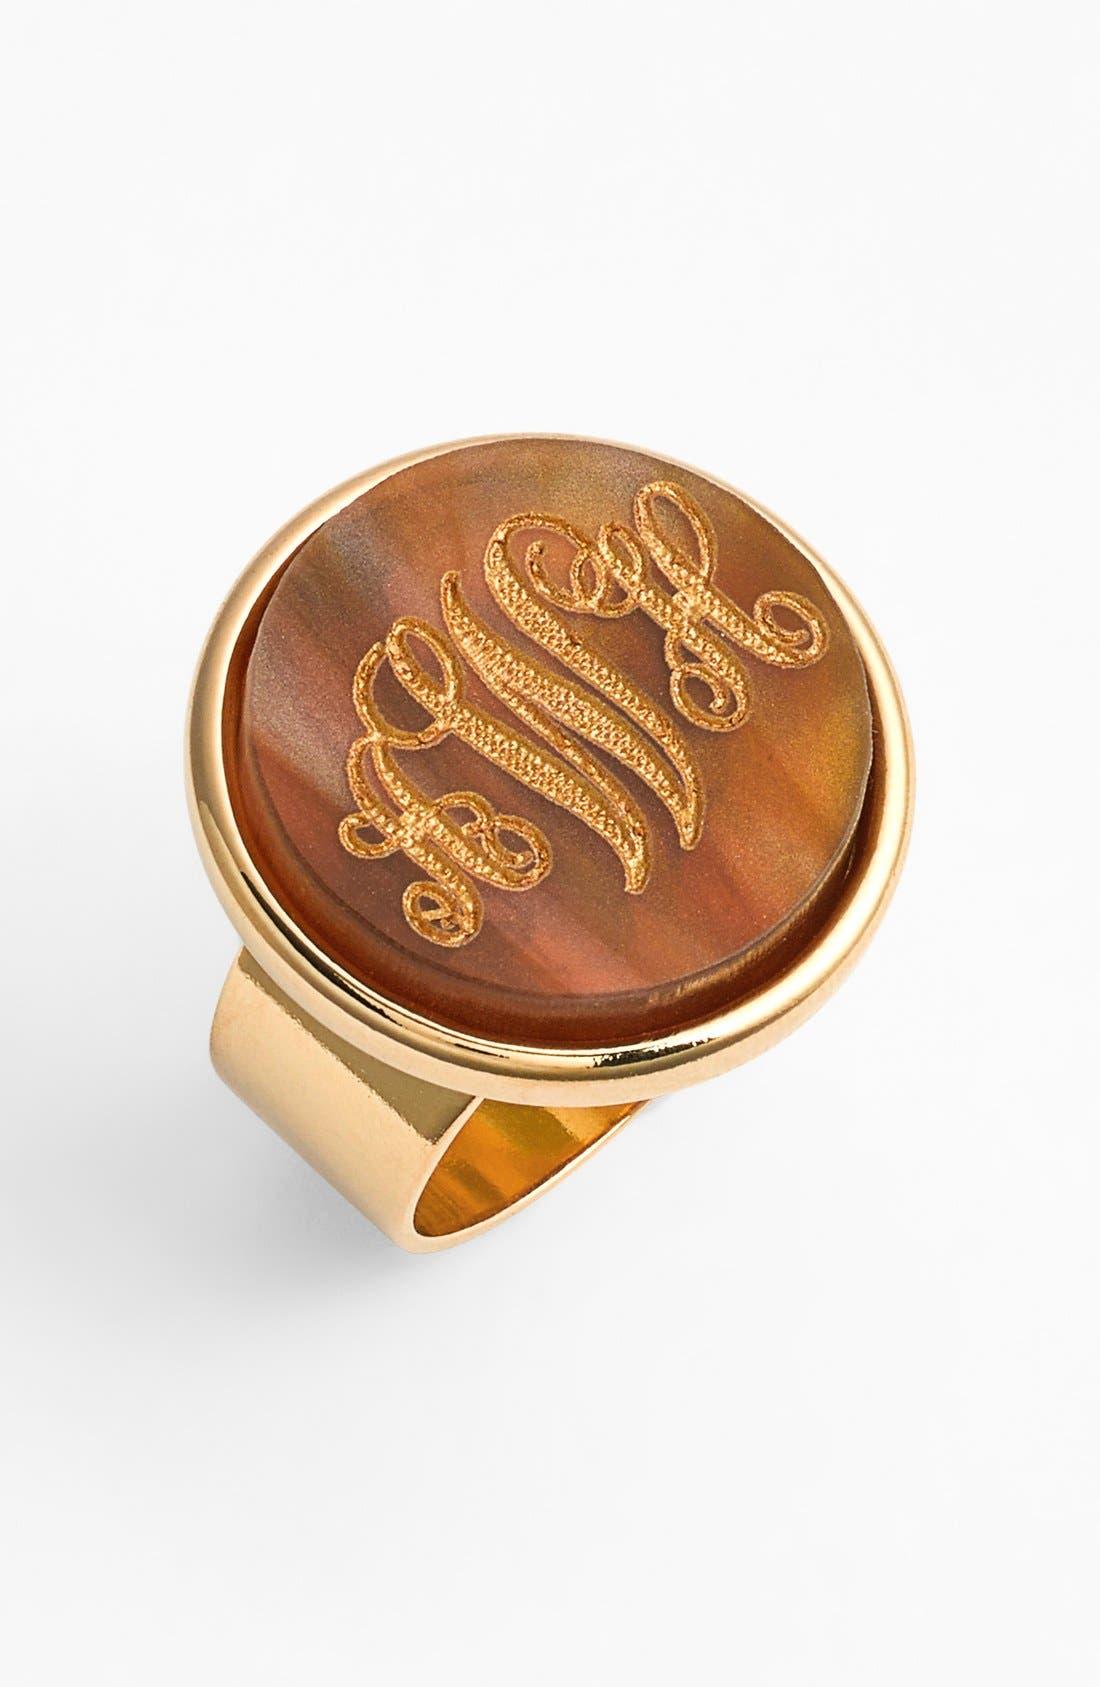 Moon and Lola 'Vineyard' Personalized Monogram Ring